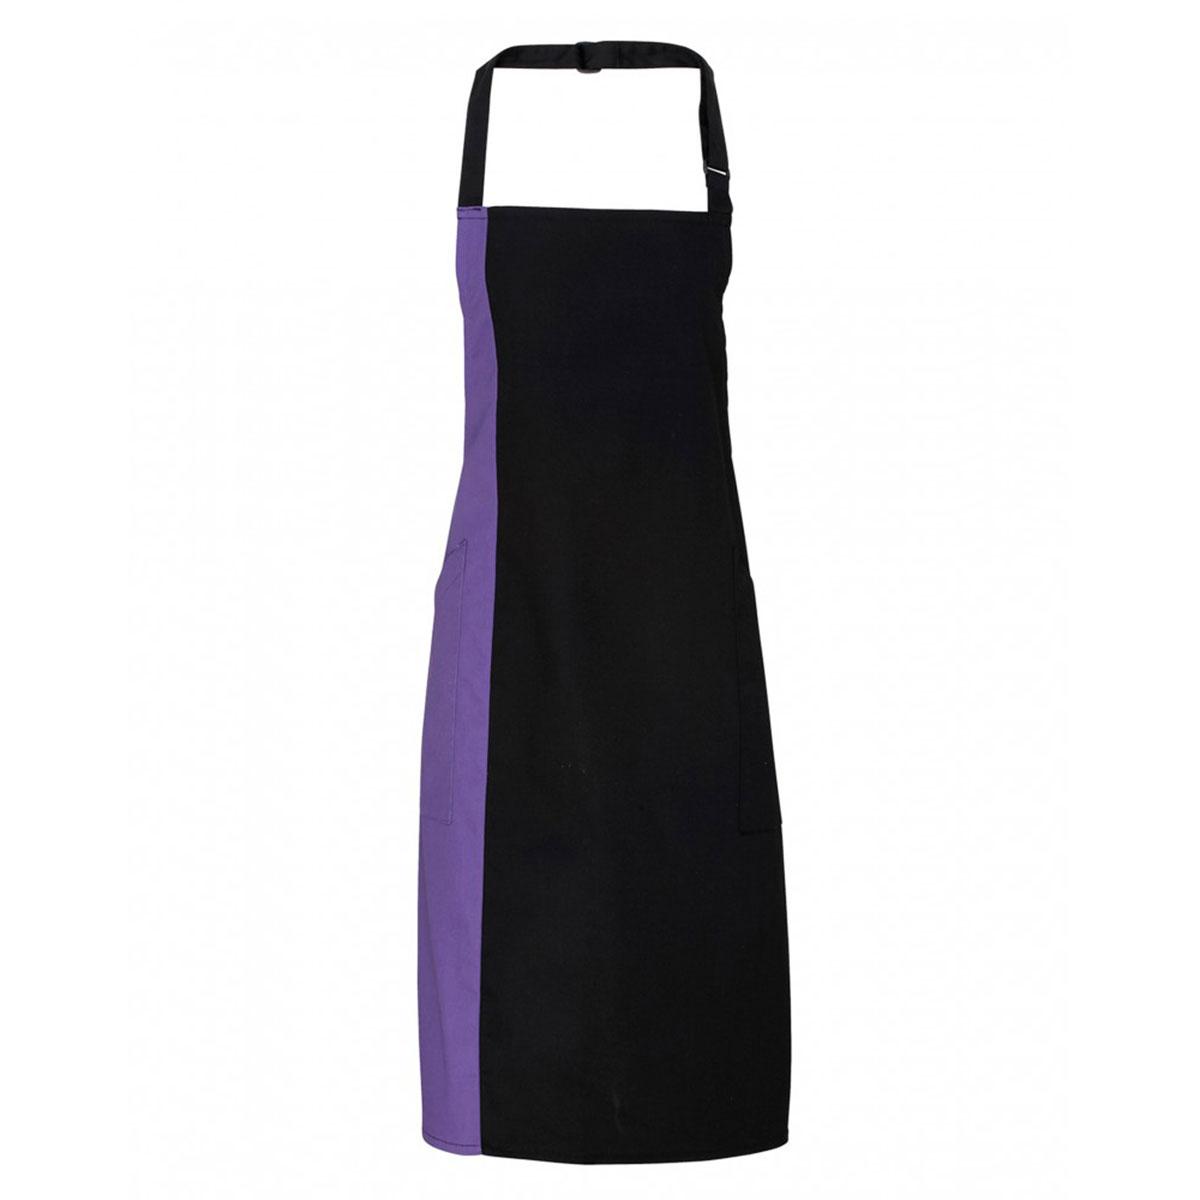 Contrast Bib Apron - pr162_black_purple